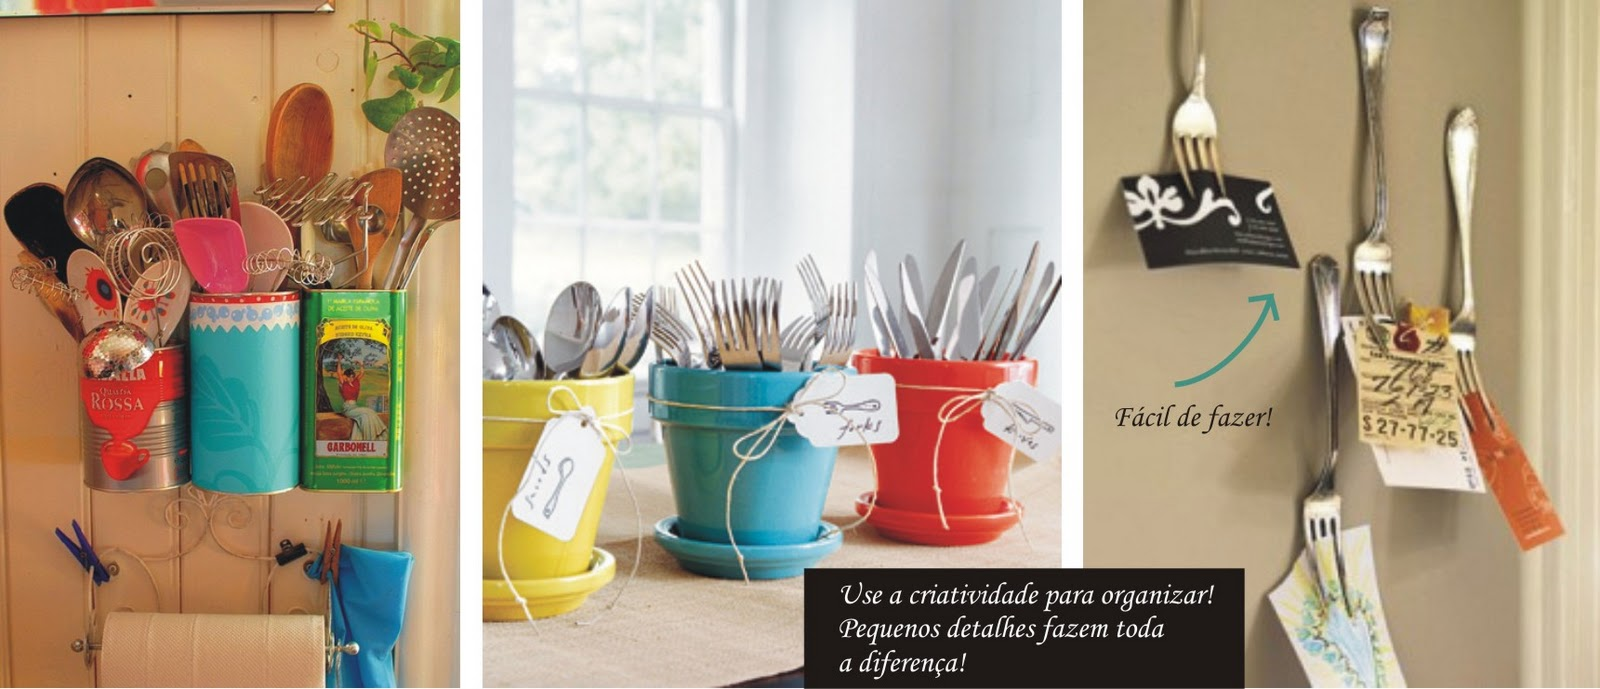 andersson simplyseleta e craftstew organize utensílios e outros